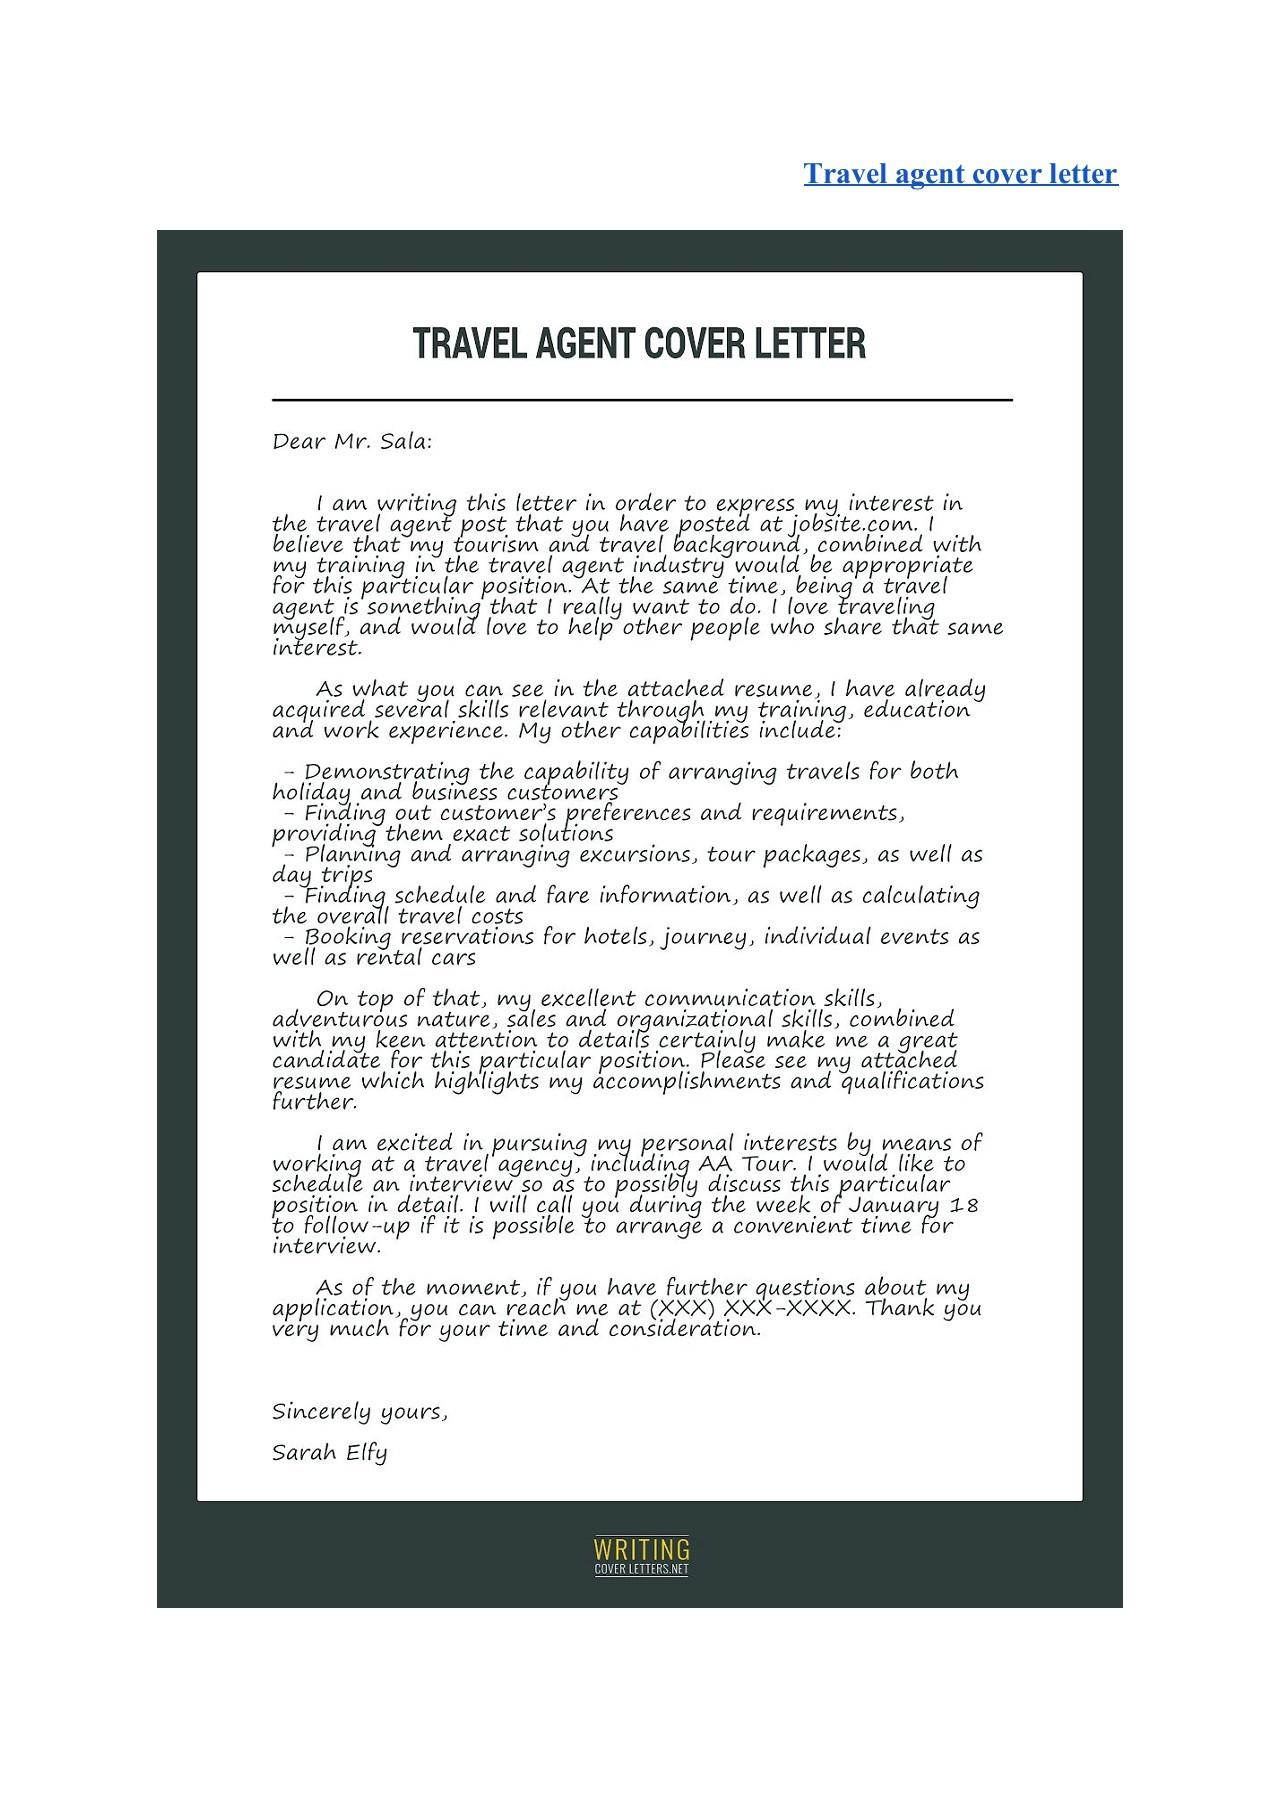 Best Cover Letter Samples Flip Book Pages 1 10 Pubhtml5